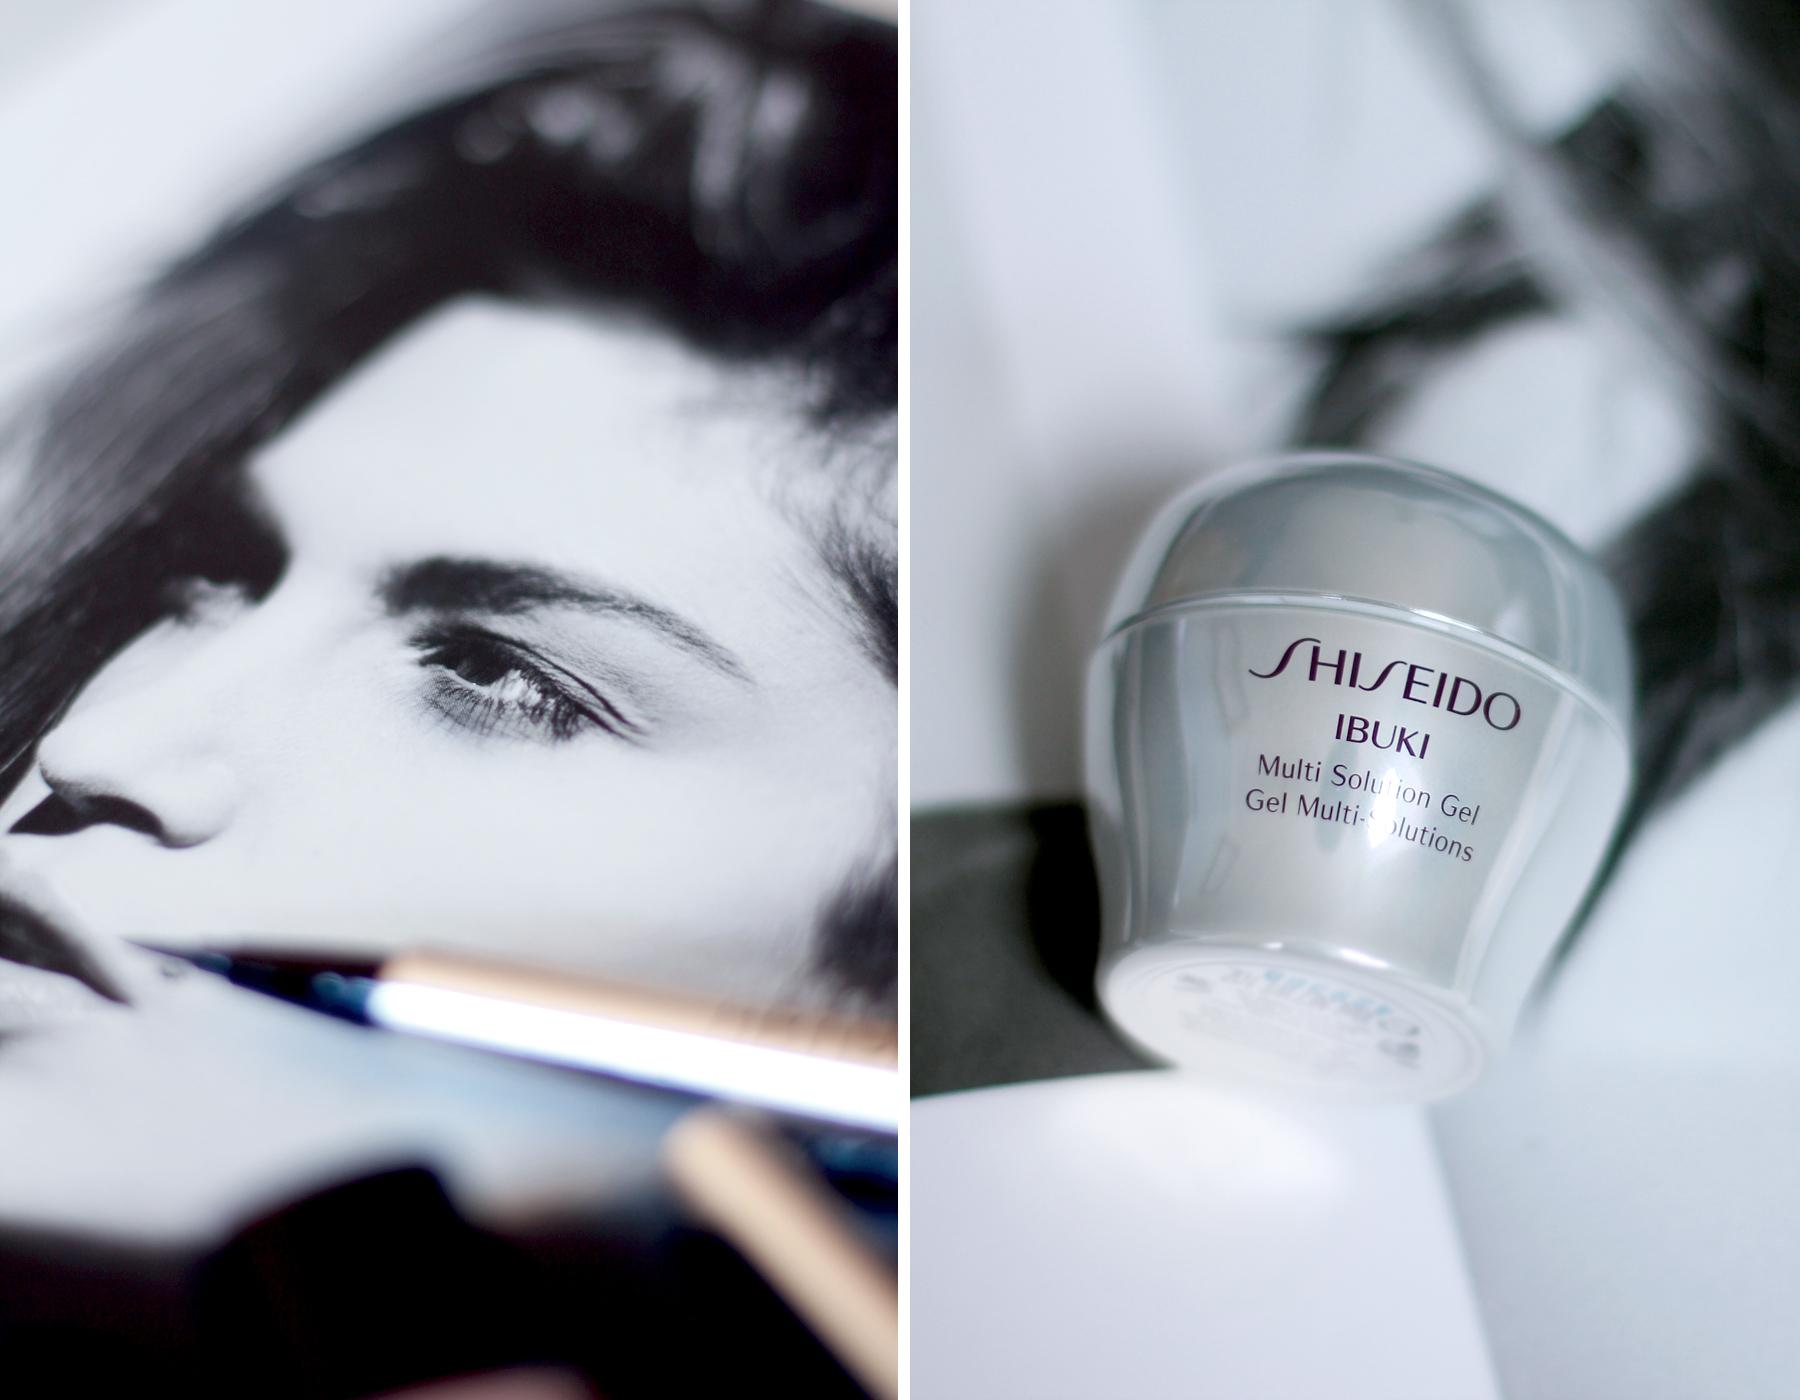 nude look beauty favorites summer 2015 shiseido l'oreal m.a.c. douglas beautyblogger ricarda schernus düsseldorf berlin 5